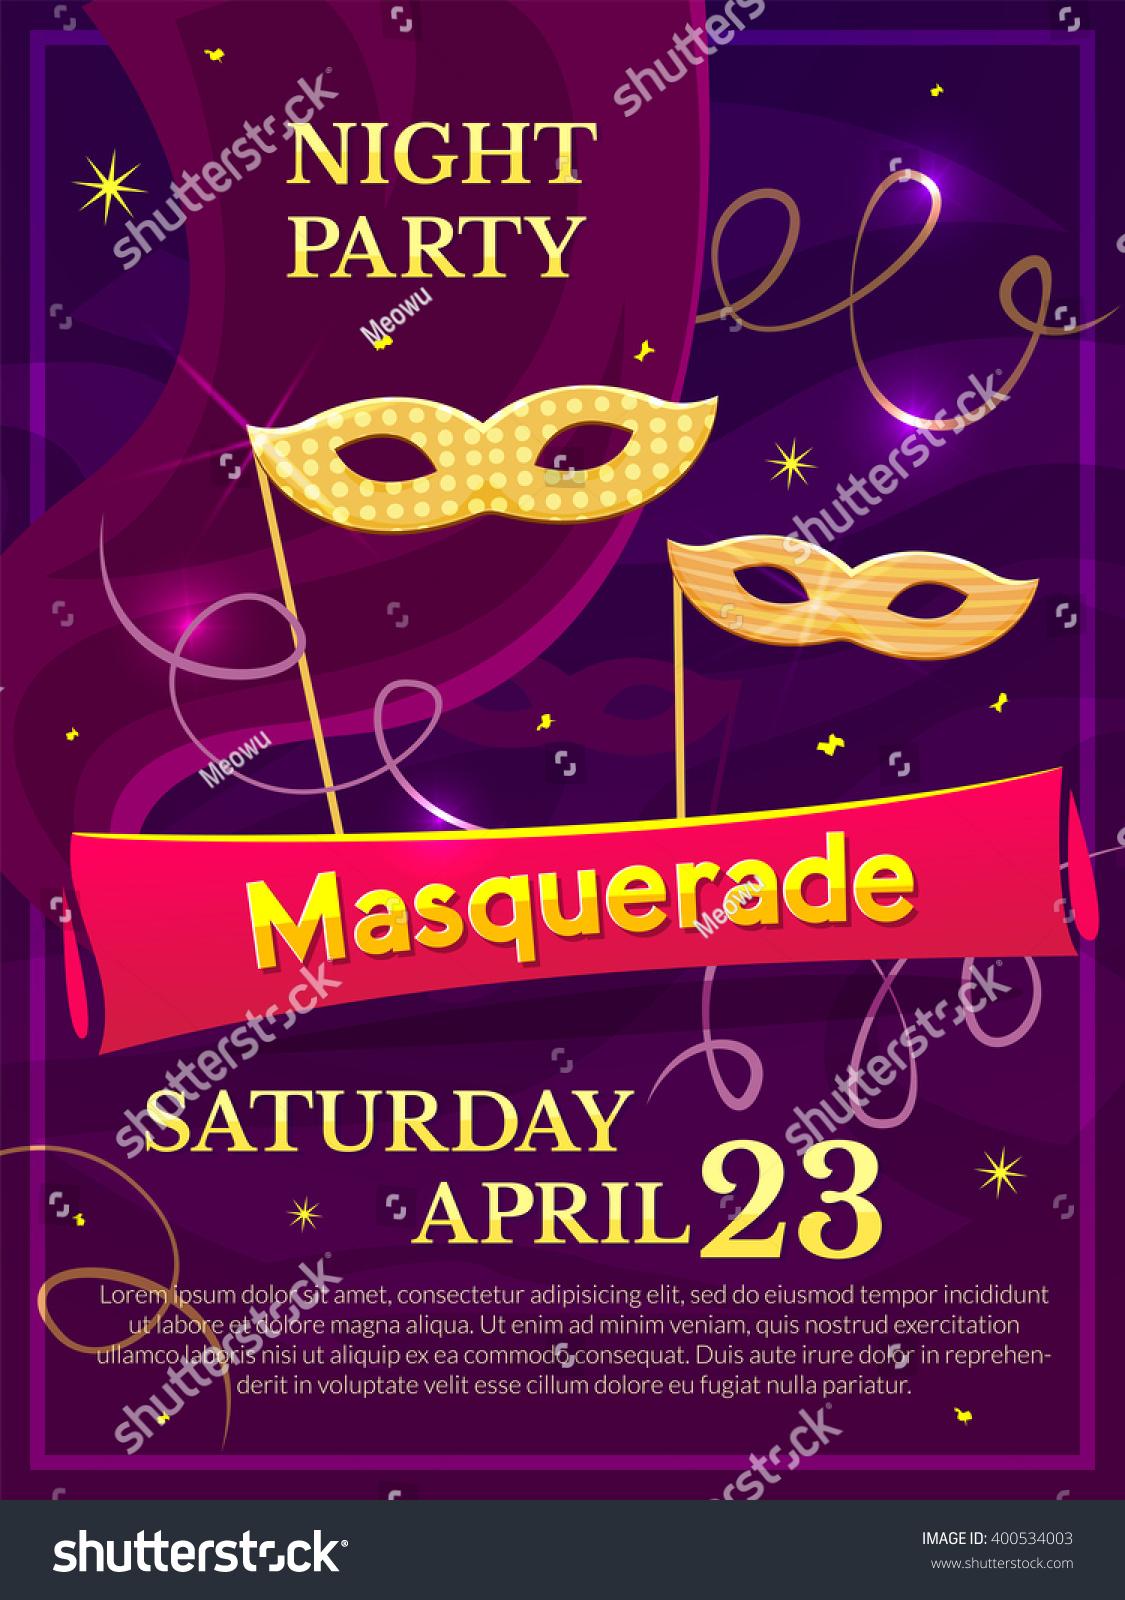 Masquerade Poster Invitation Theme Party Nightclub Stock Vector ...